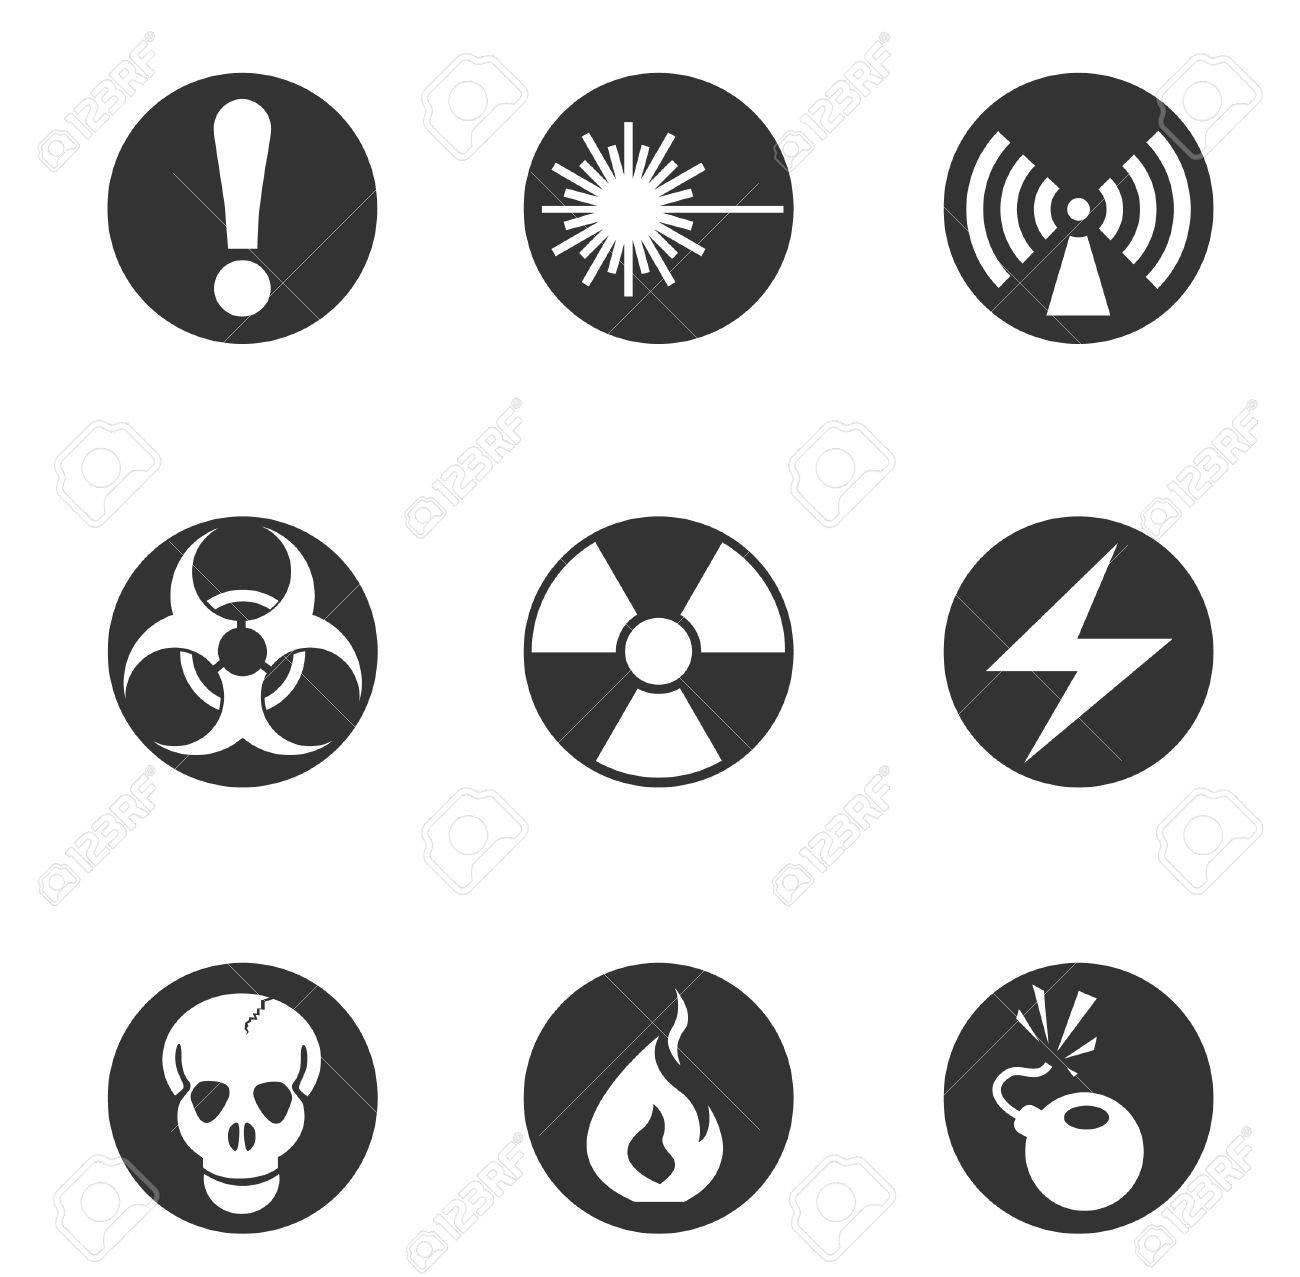 Hazard Sign Icons Stock Vector - 28491022